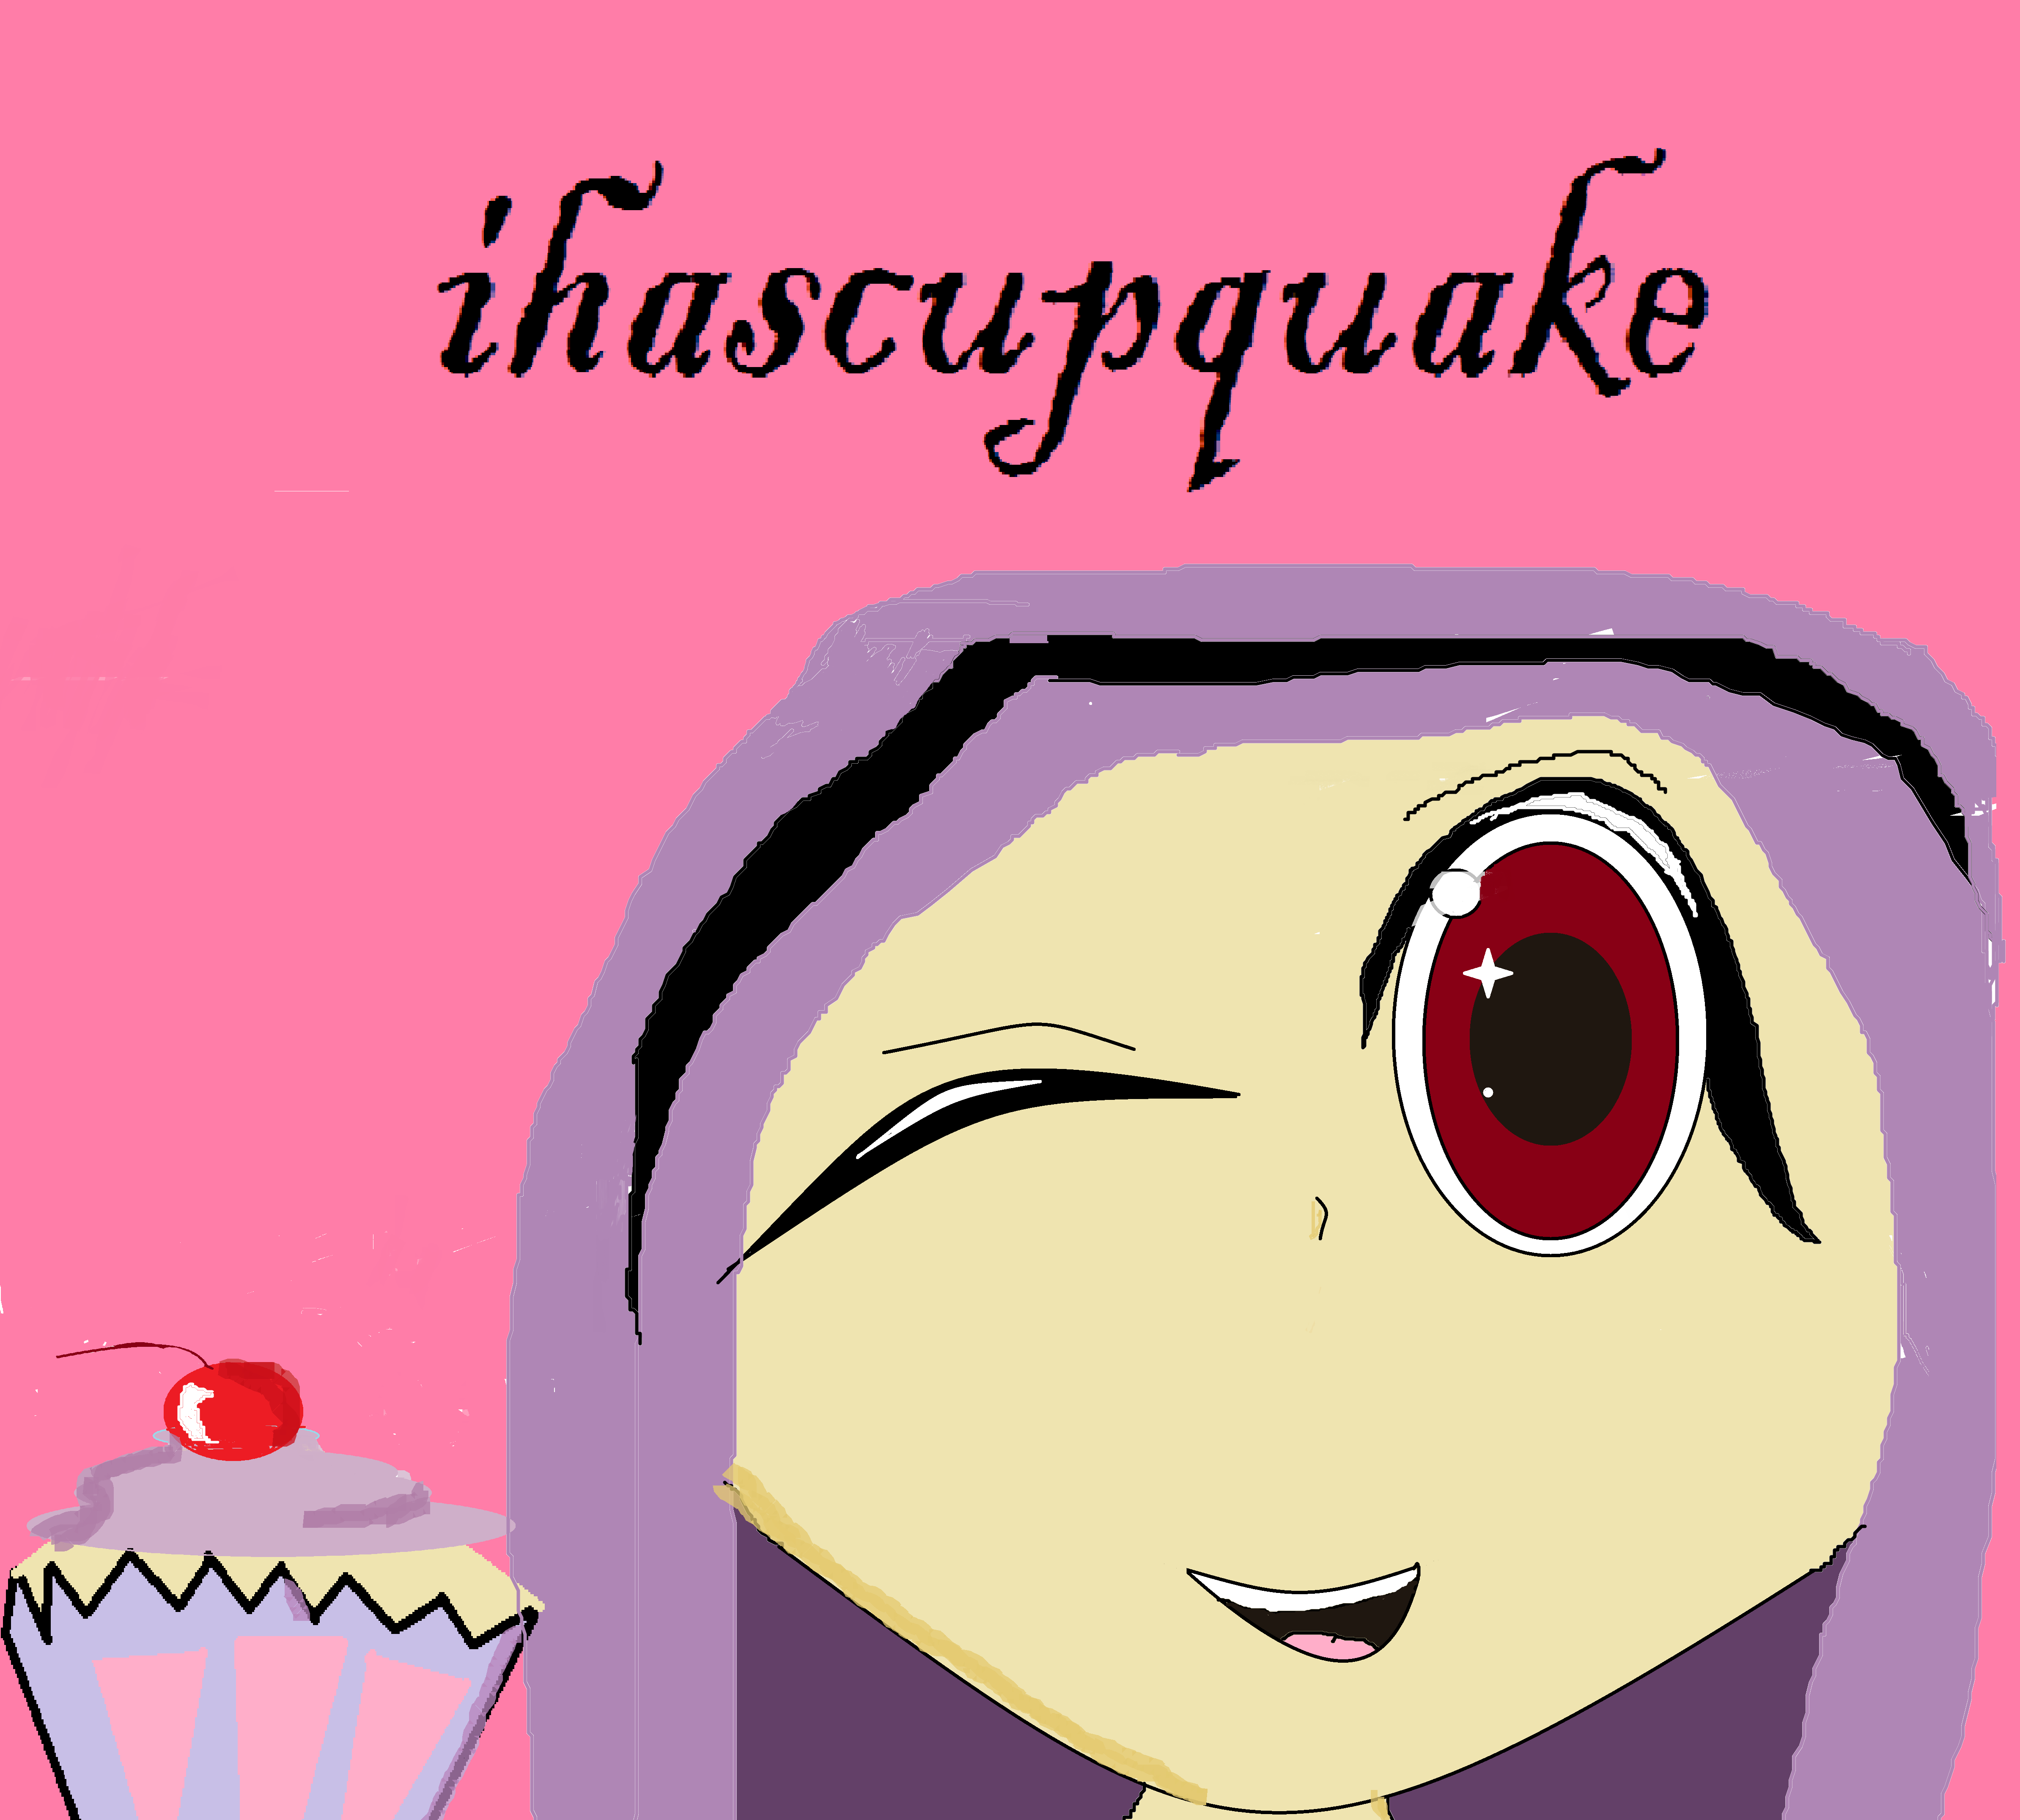 ihascupquake